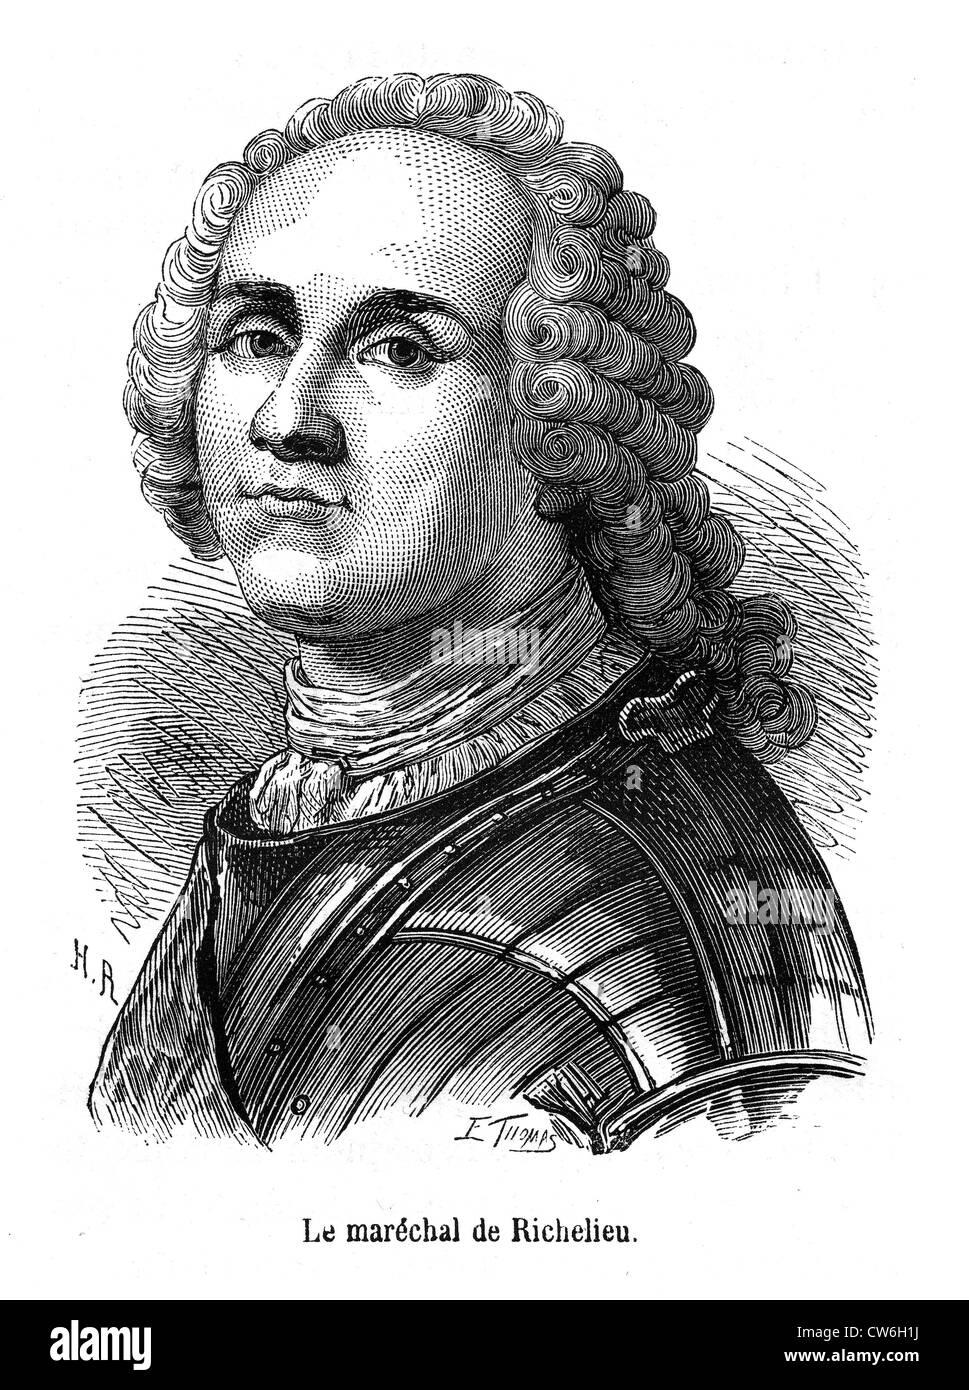 Marshall of Richelieu - Stock Image